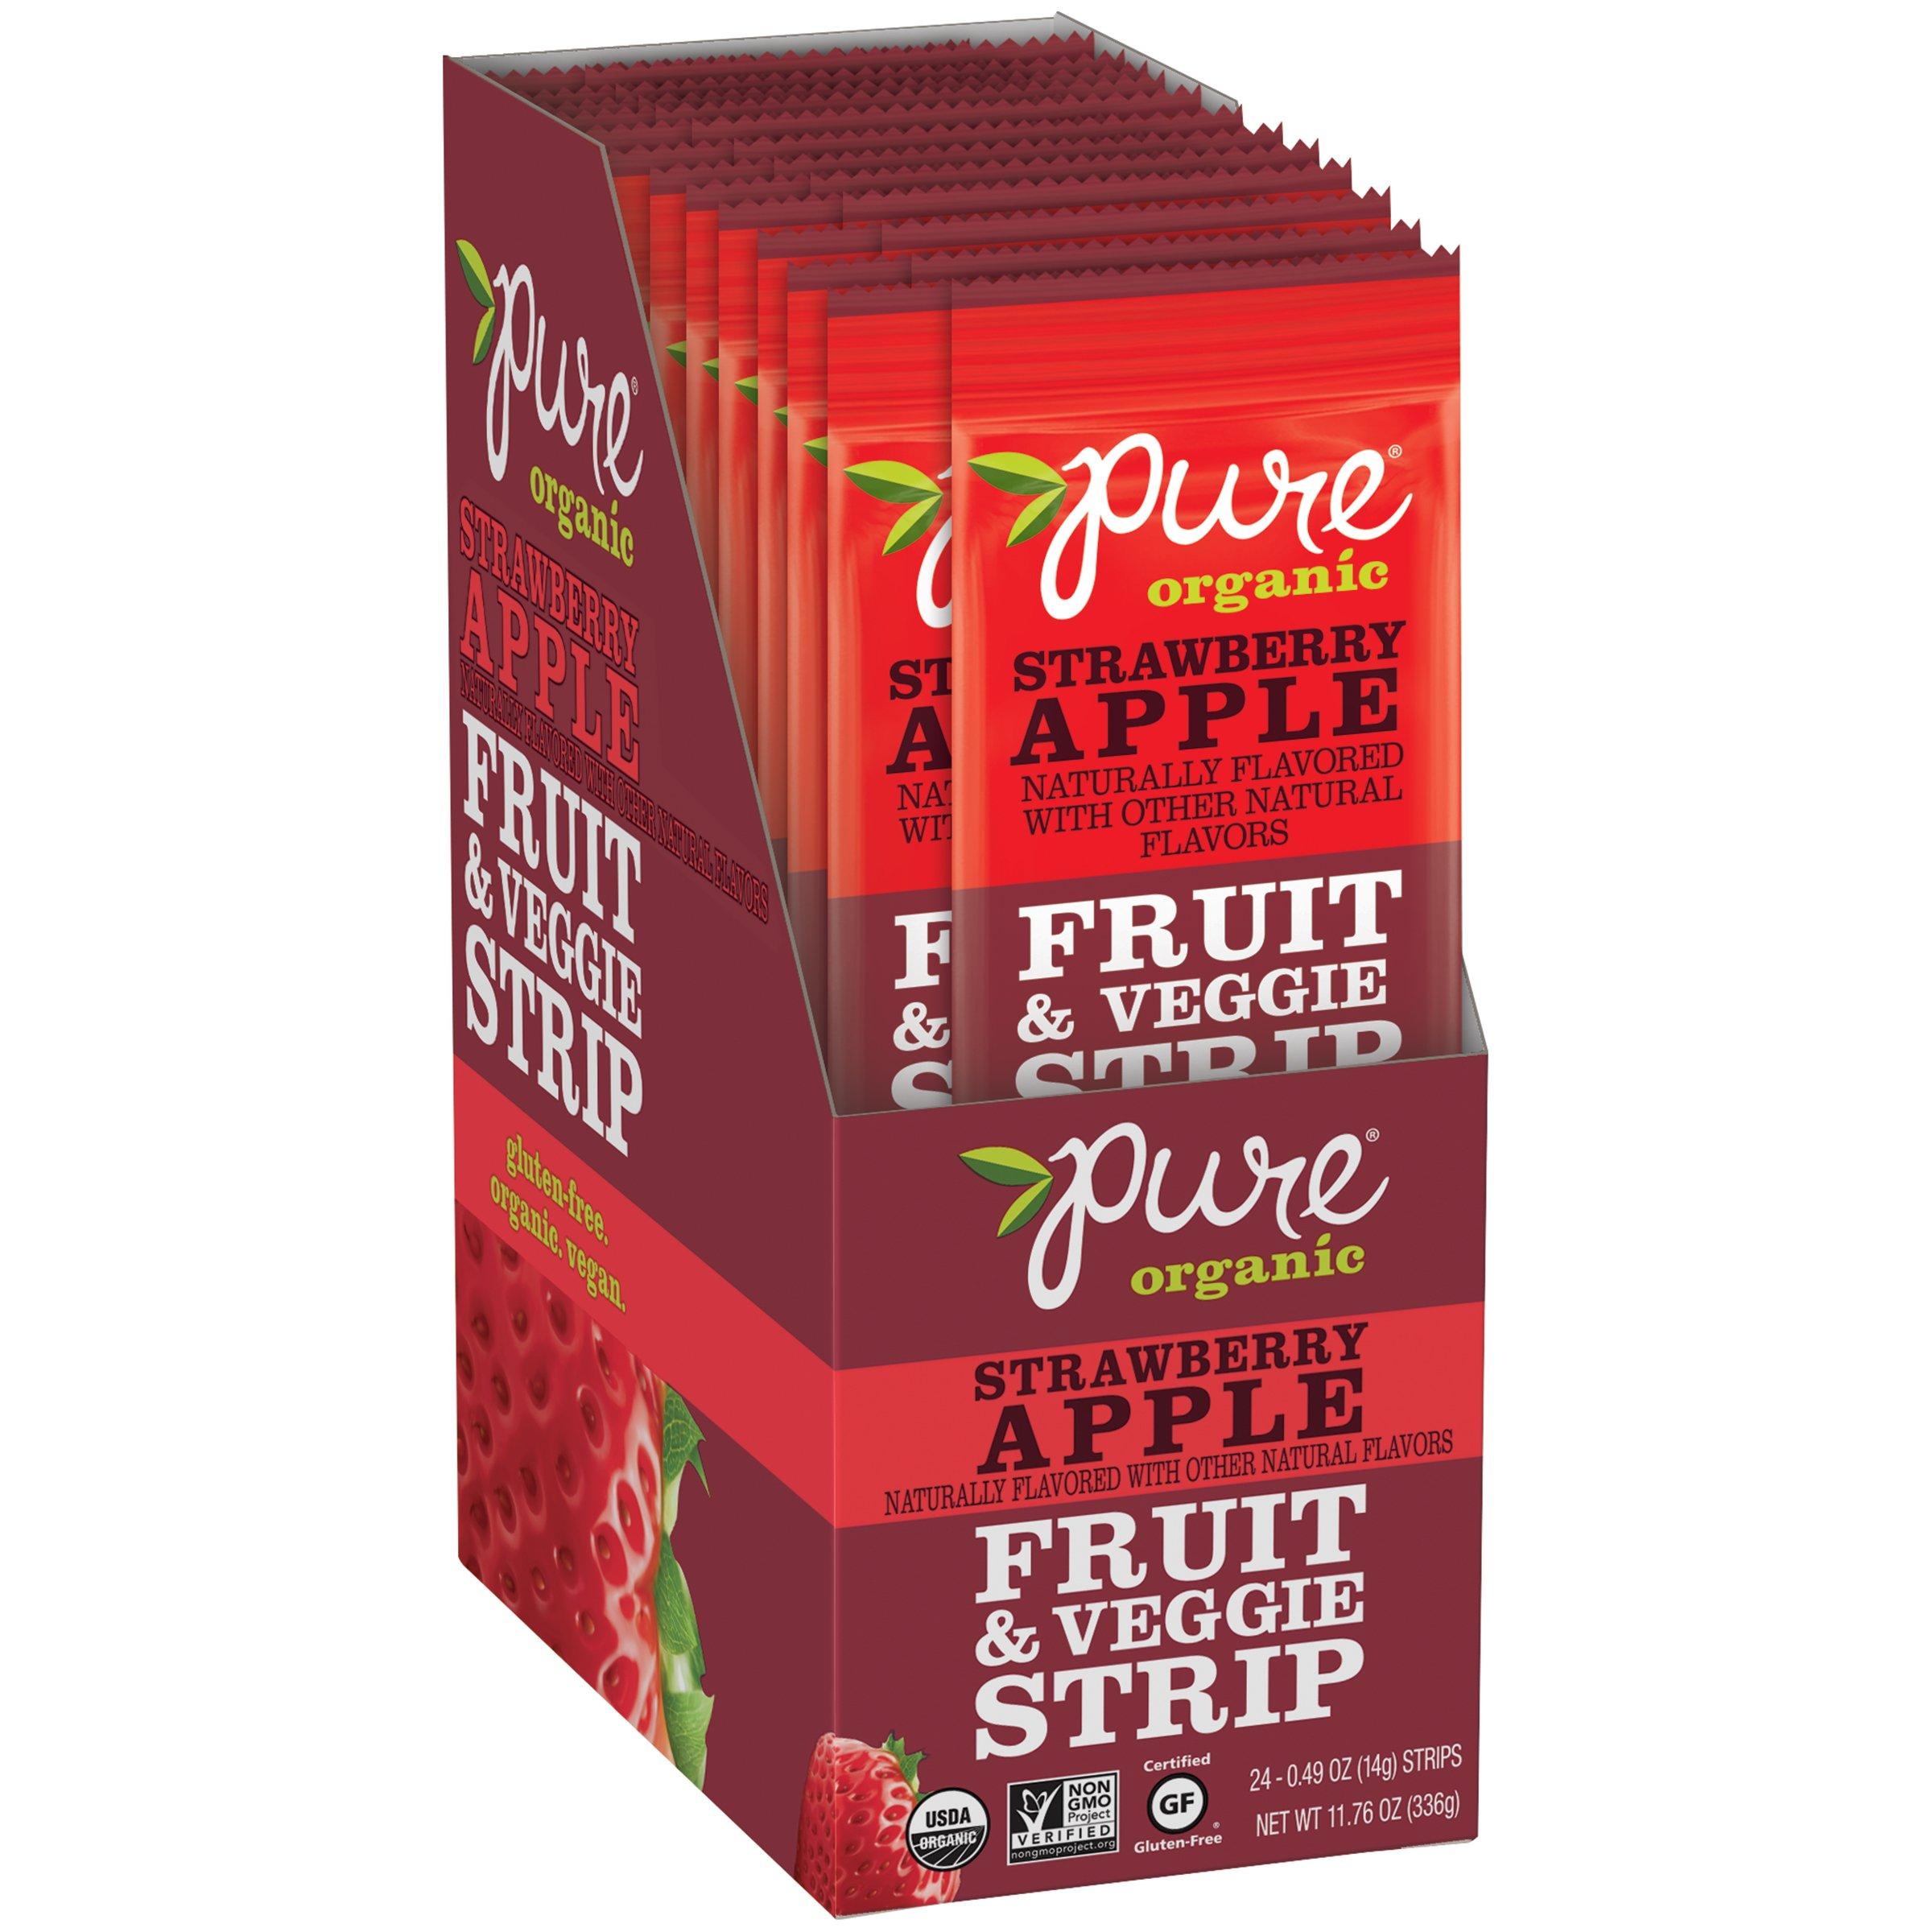 Pure Organic Strawberry Apple Fruit & Veg Strip, 24 ct